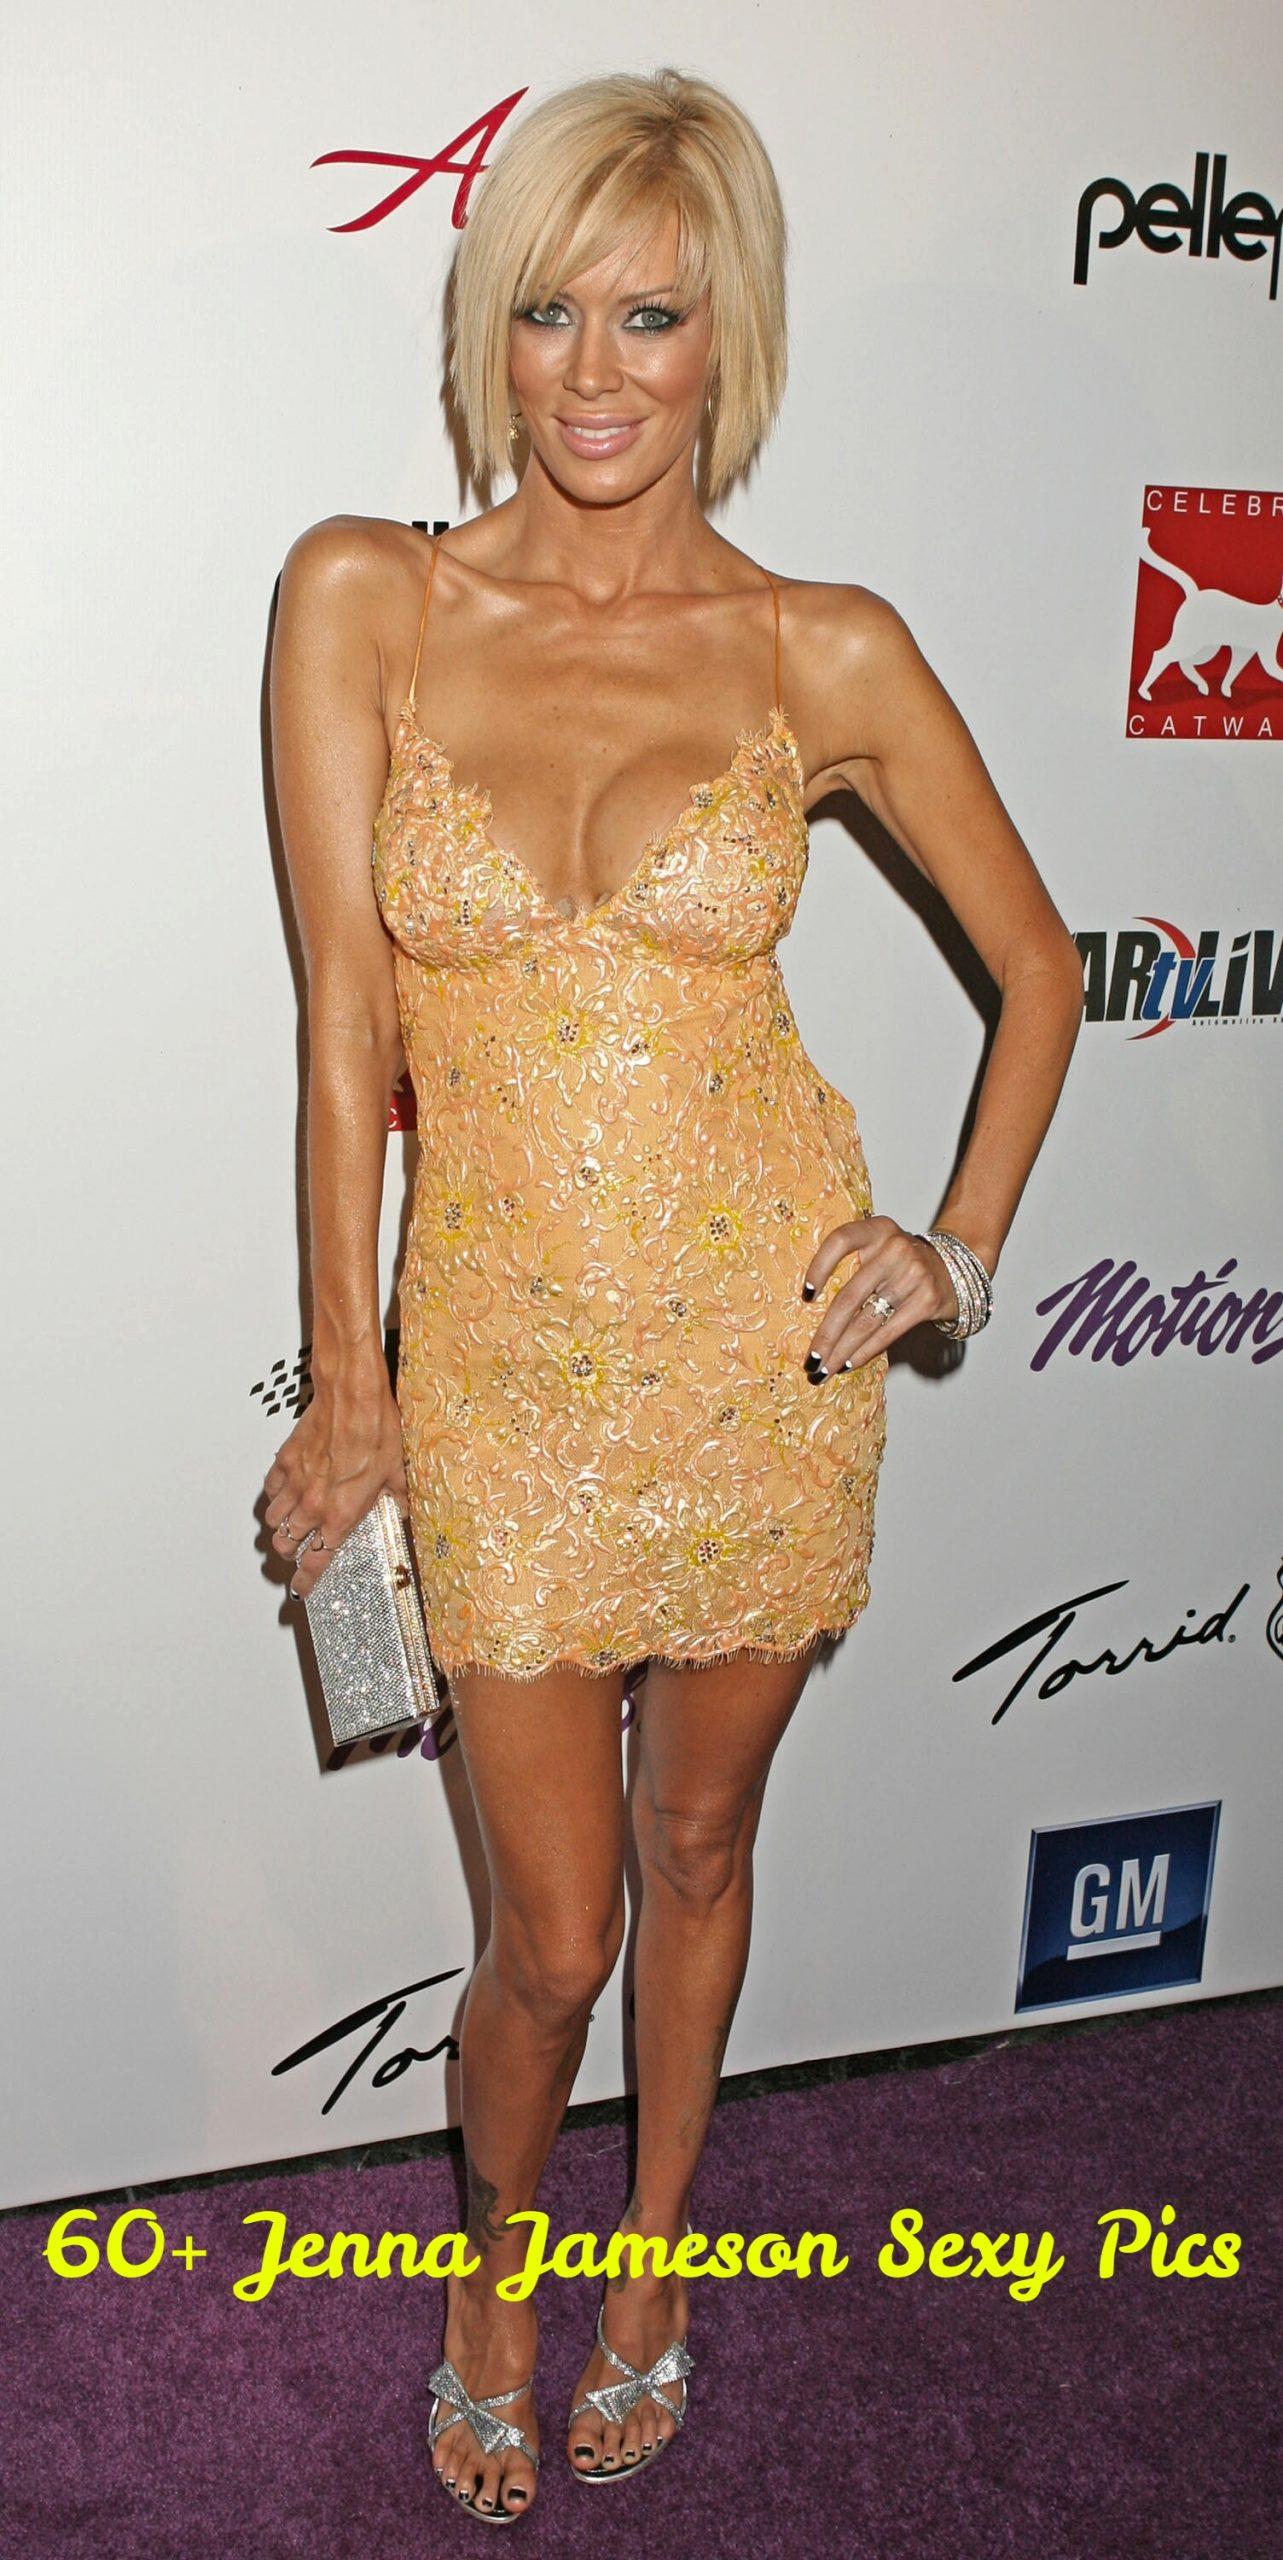 Jenna Jameson hot pics